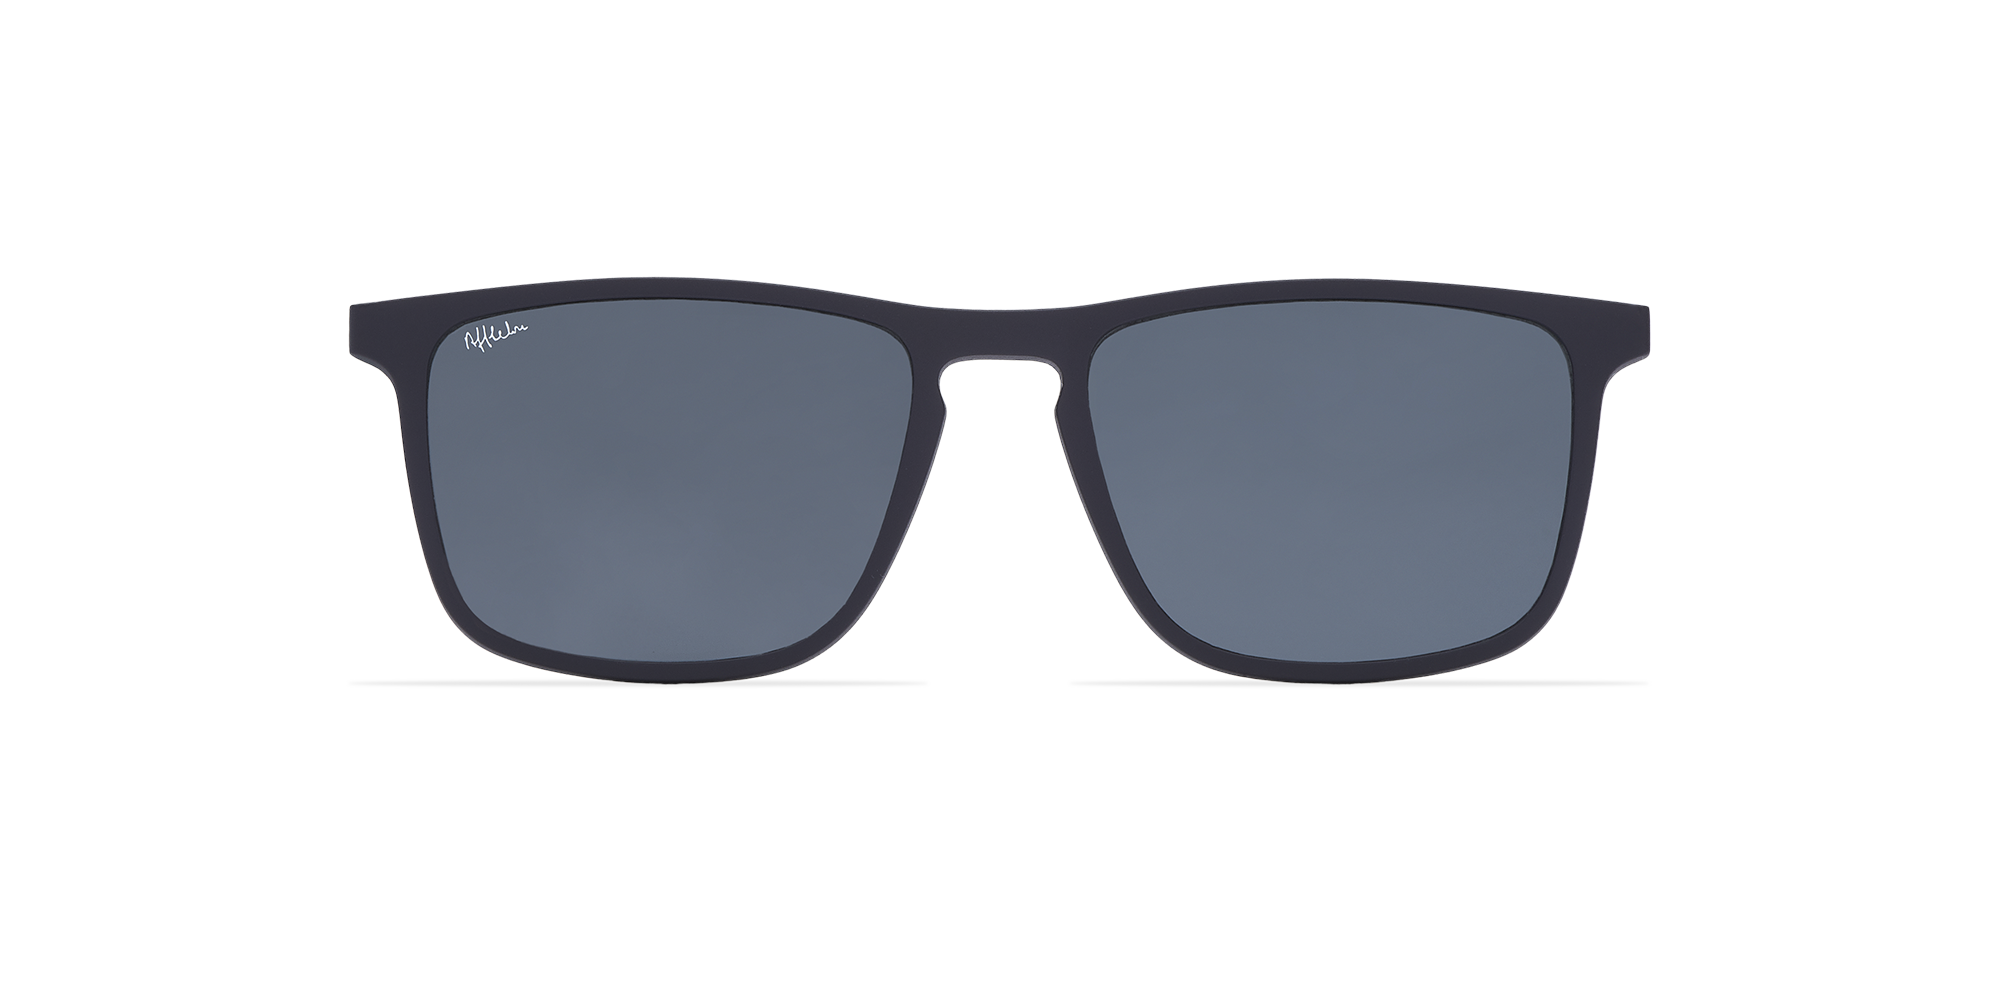 afflelou/france/products/smart_clip/clips_glasses/07630036428740_face.png